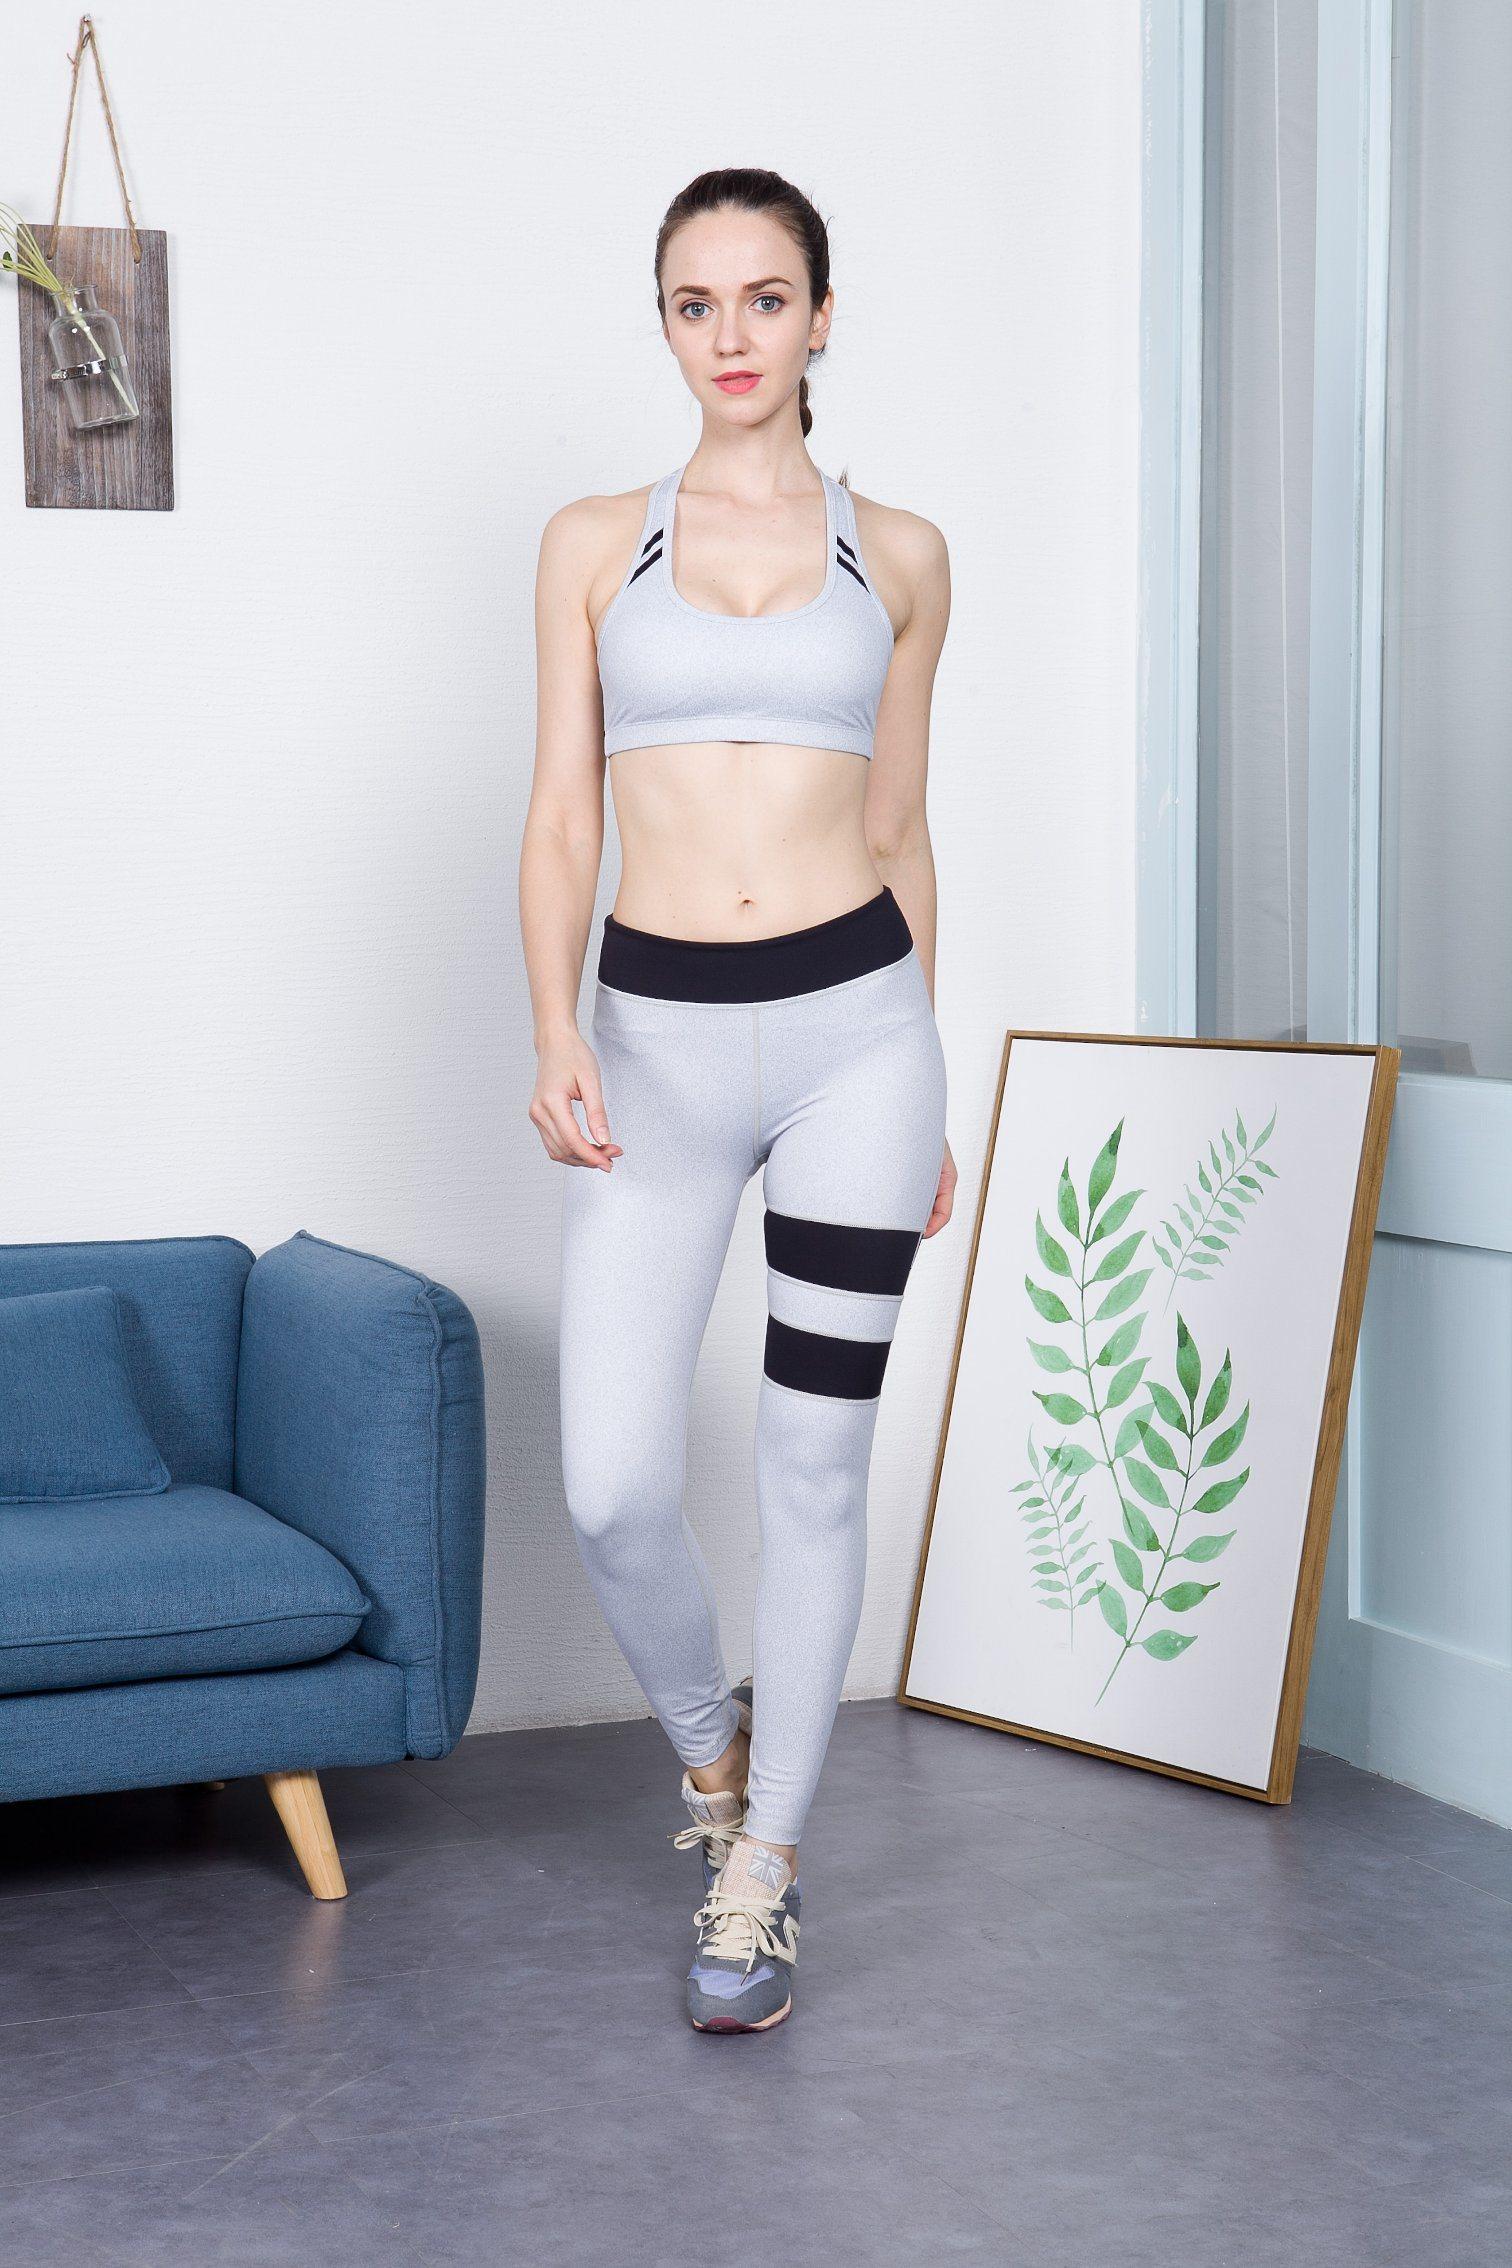 Newest Ladies Hot Fitness Yoga Pants Running Pants 2017